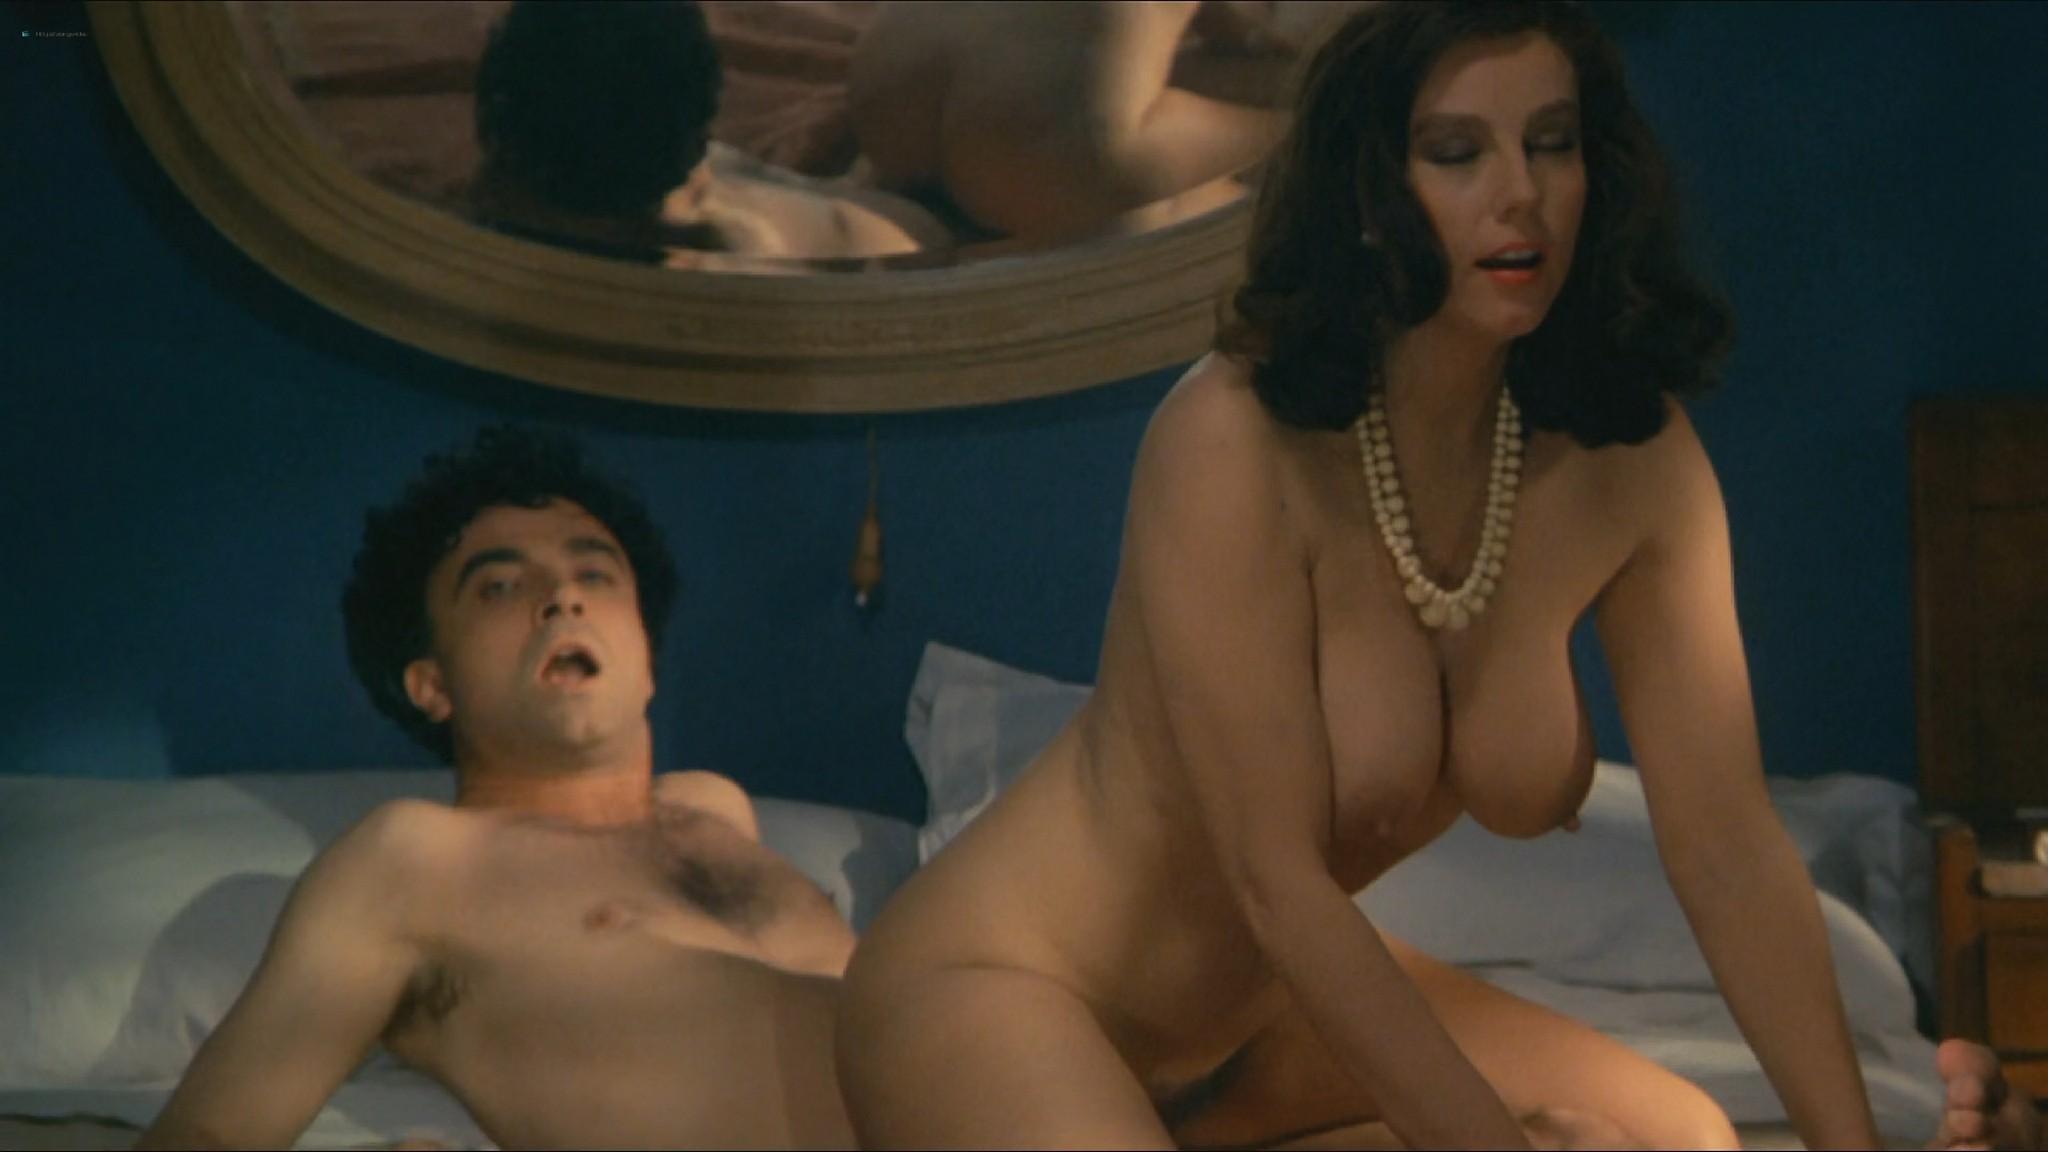 Stefania Sandrelli nude topless bush explicit labia in Tinto Brass style The Key 1983 HD 1080p BluRay 16